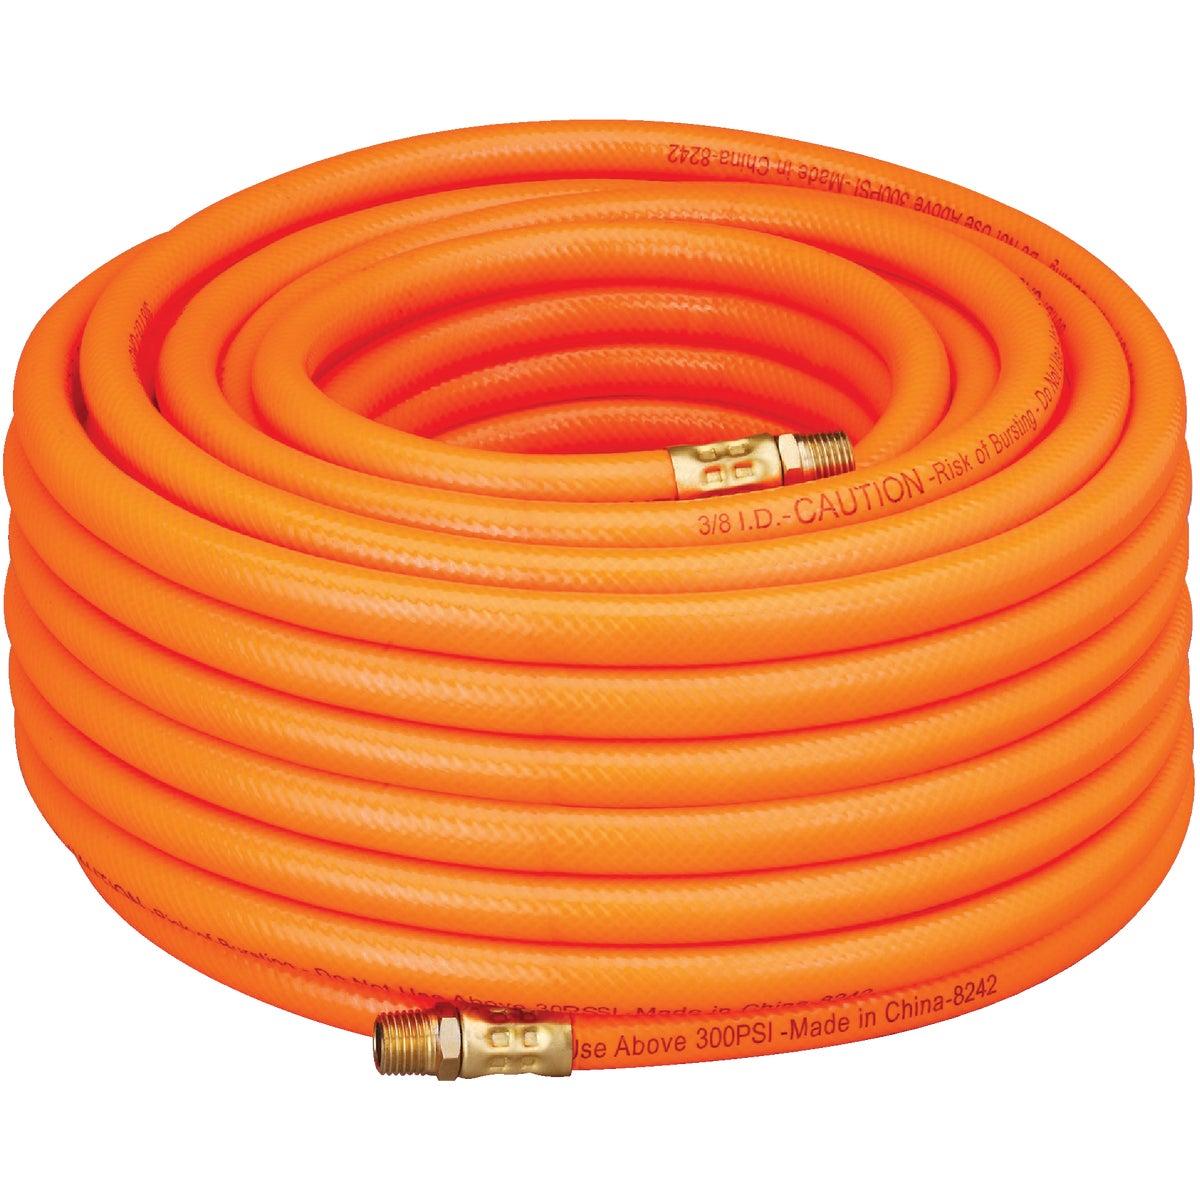 Amflo PVC Air Hose